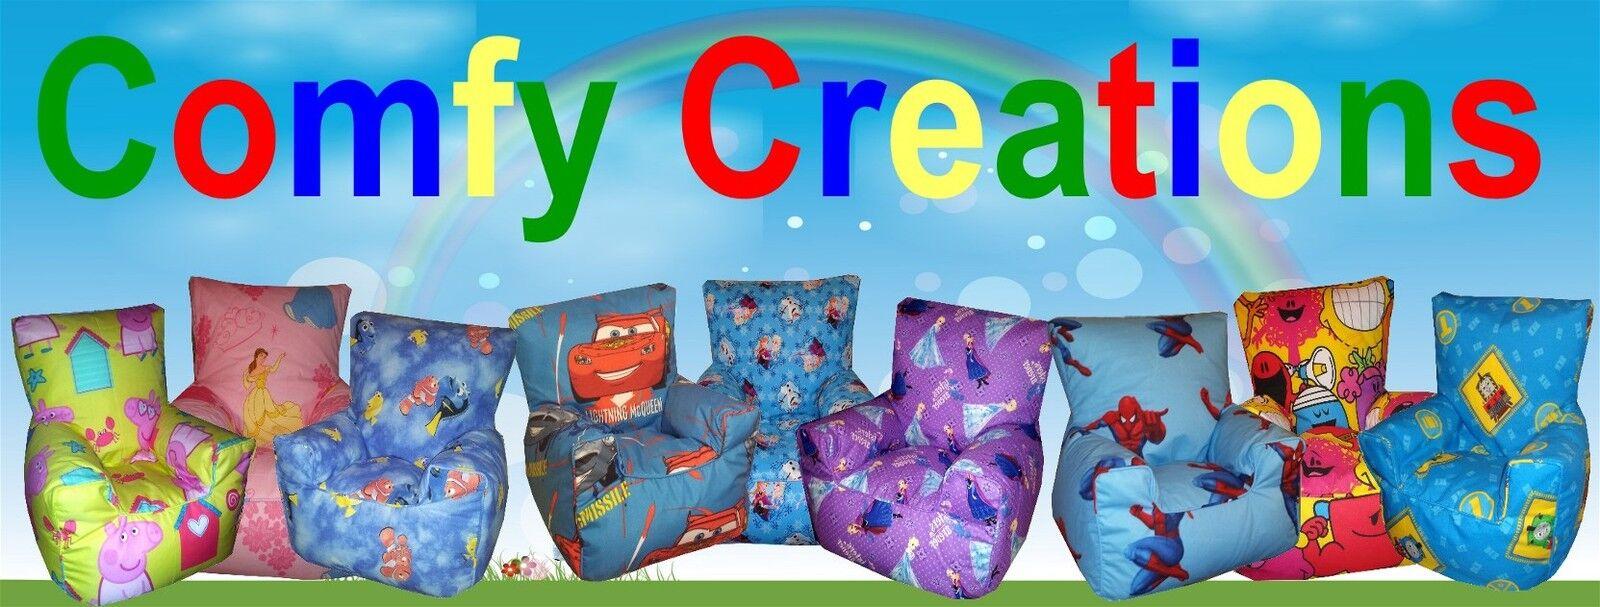 Comfy Creations UK 2012